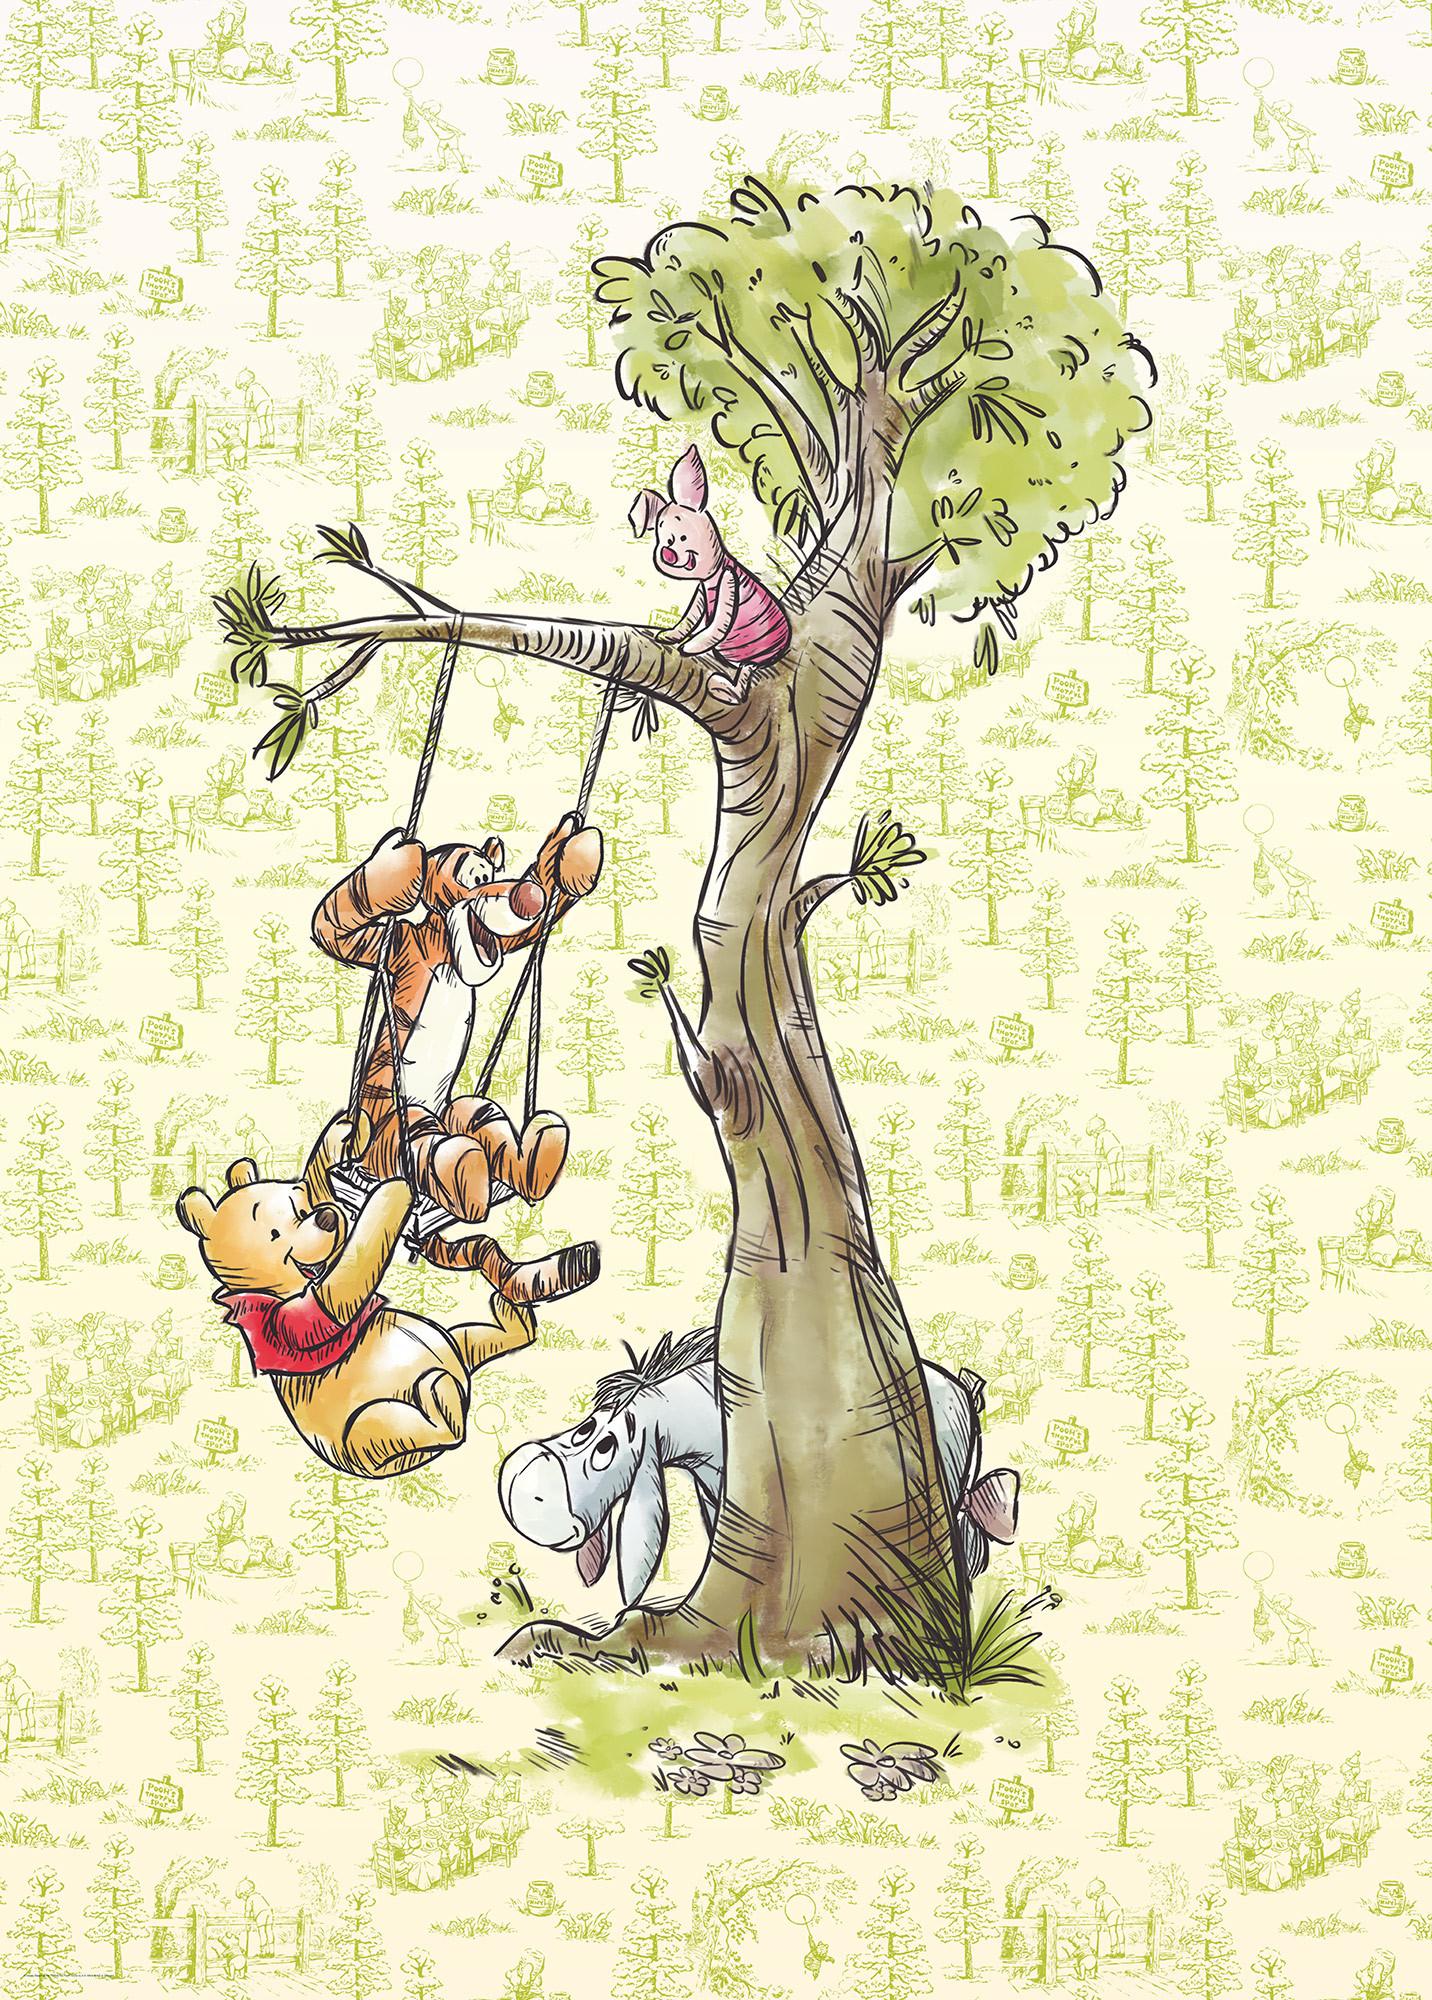 Winnie Pooh in the wood